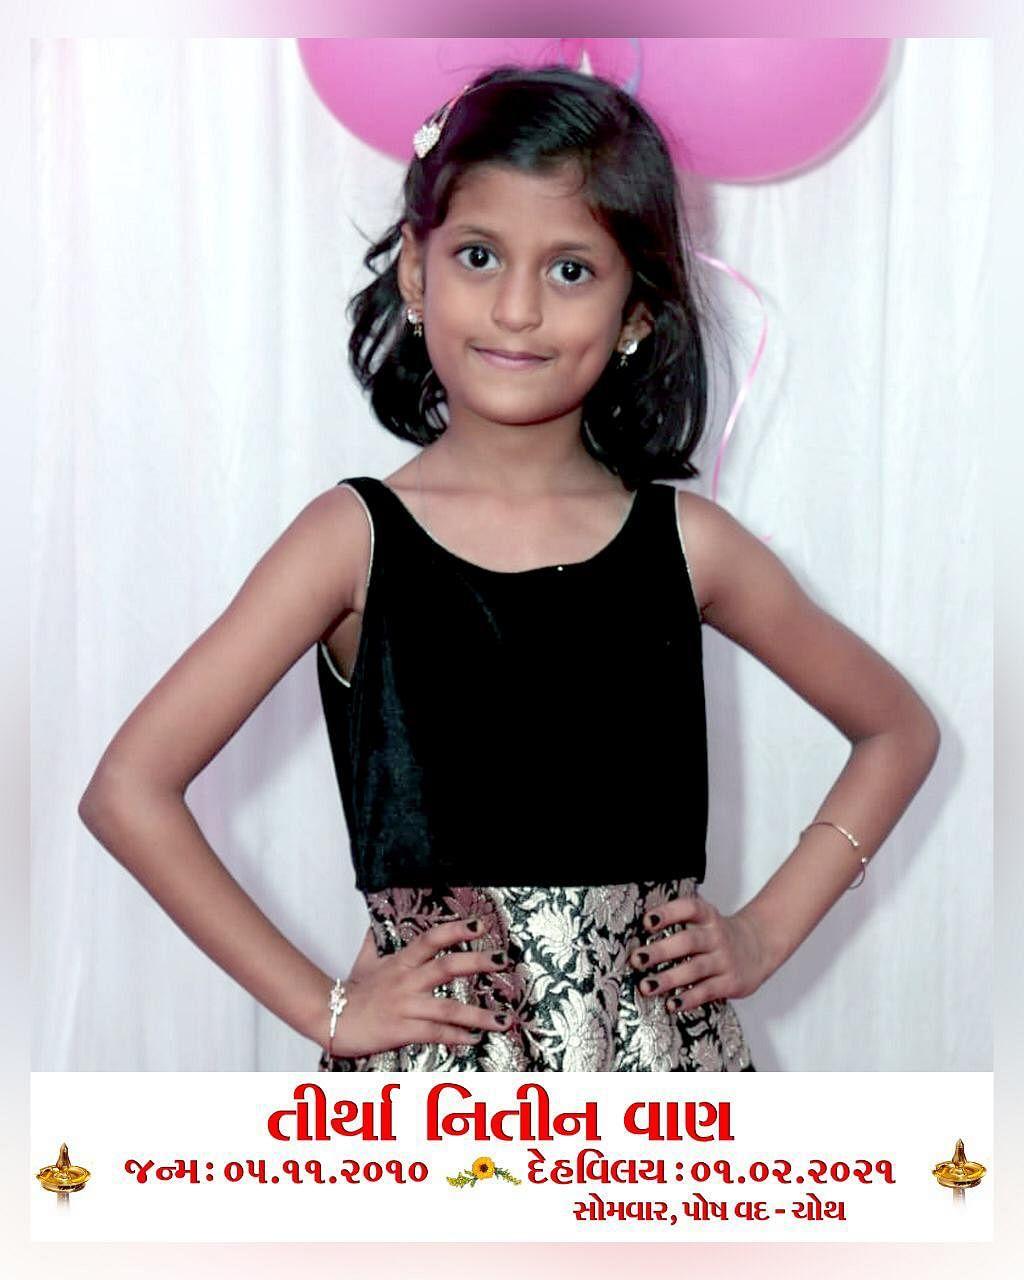 Nine-year-old girl killed in road accident in Kandivali